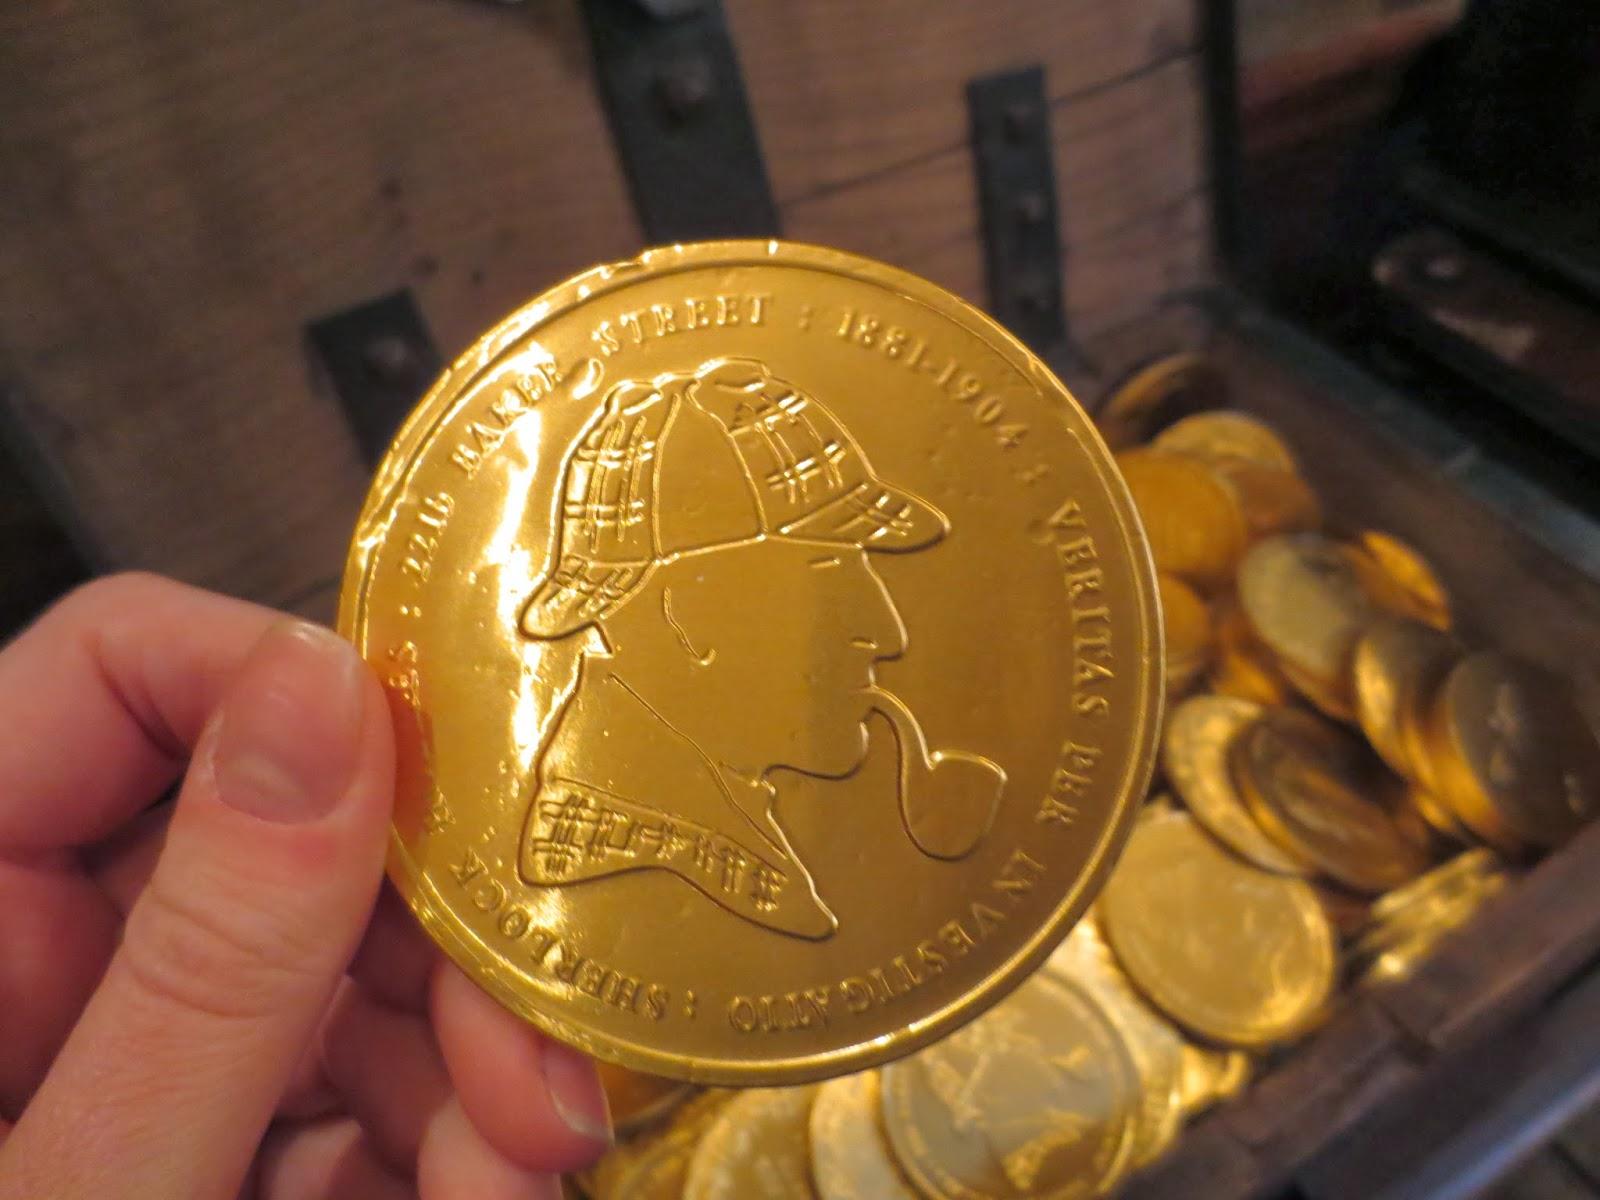 Sherlockian Chocolate Coins